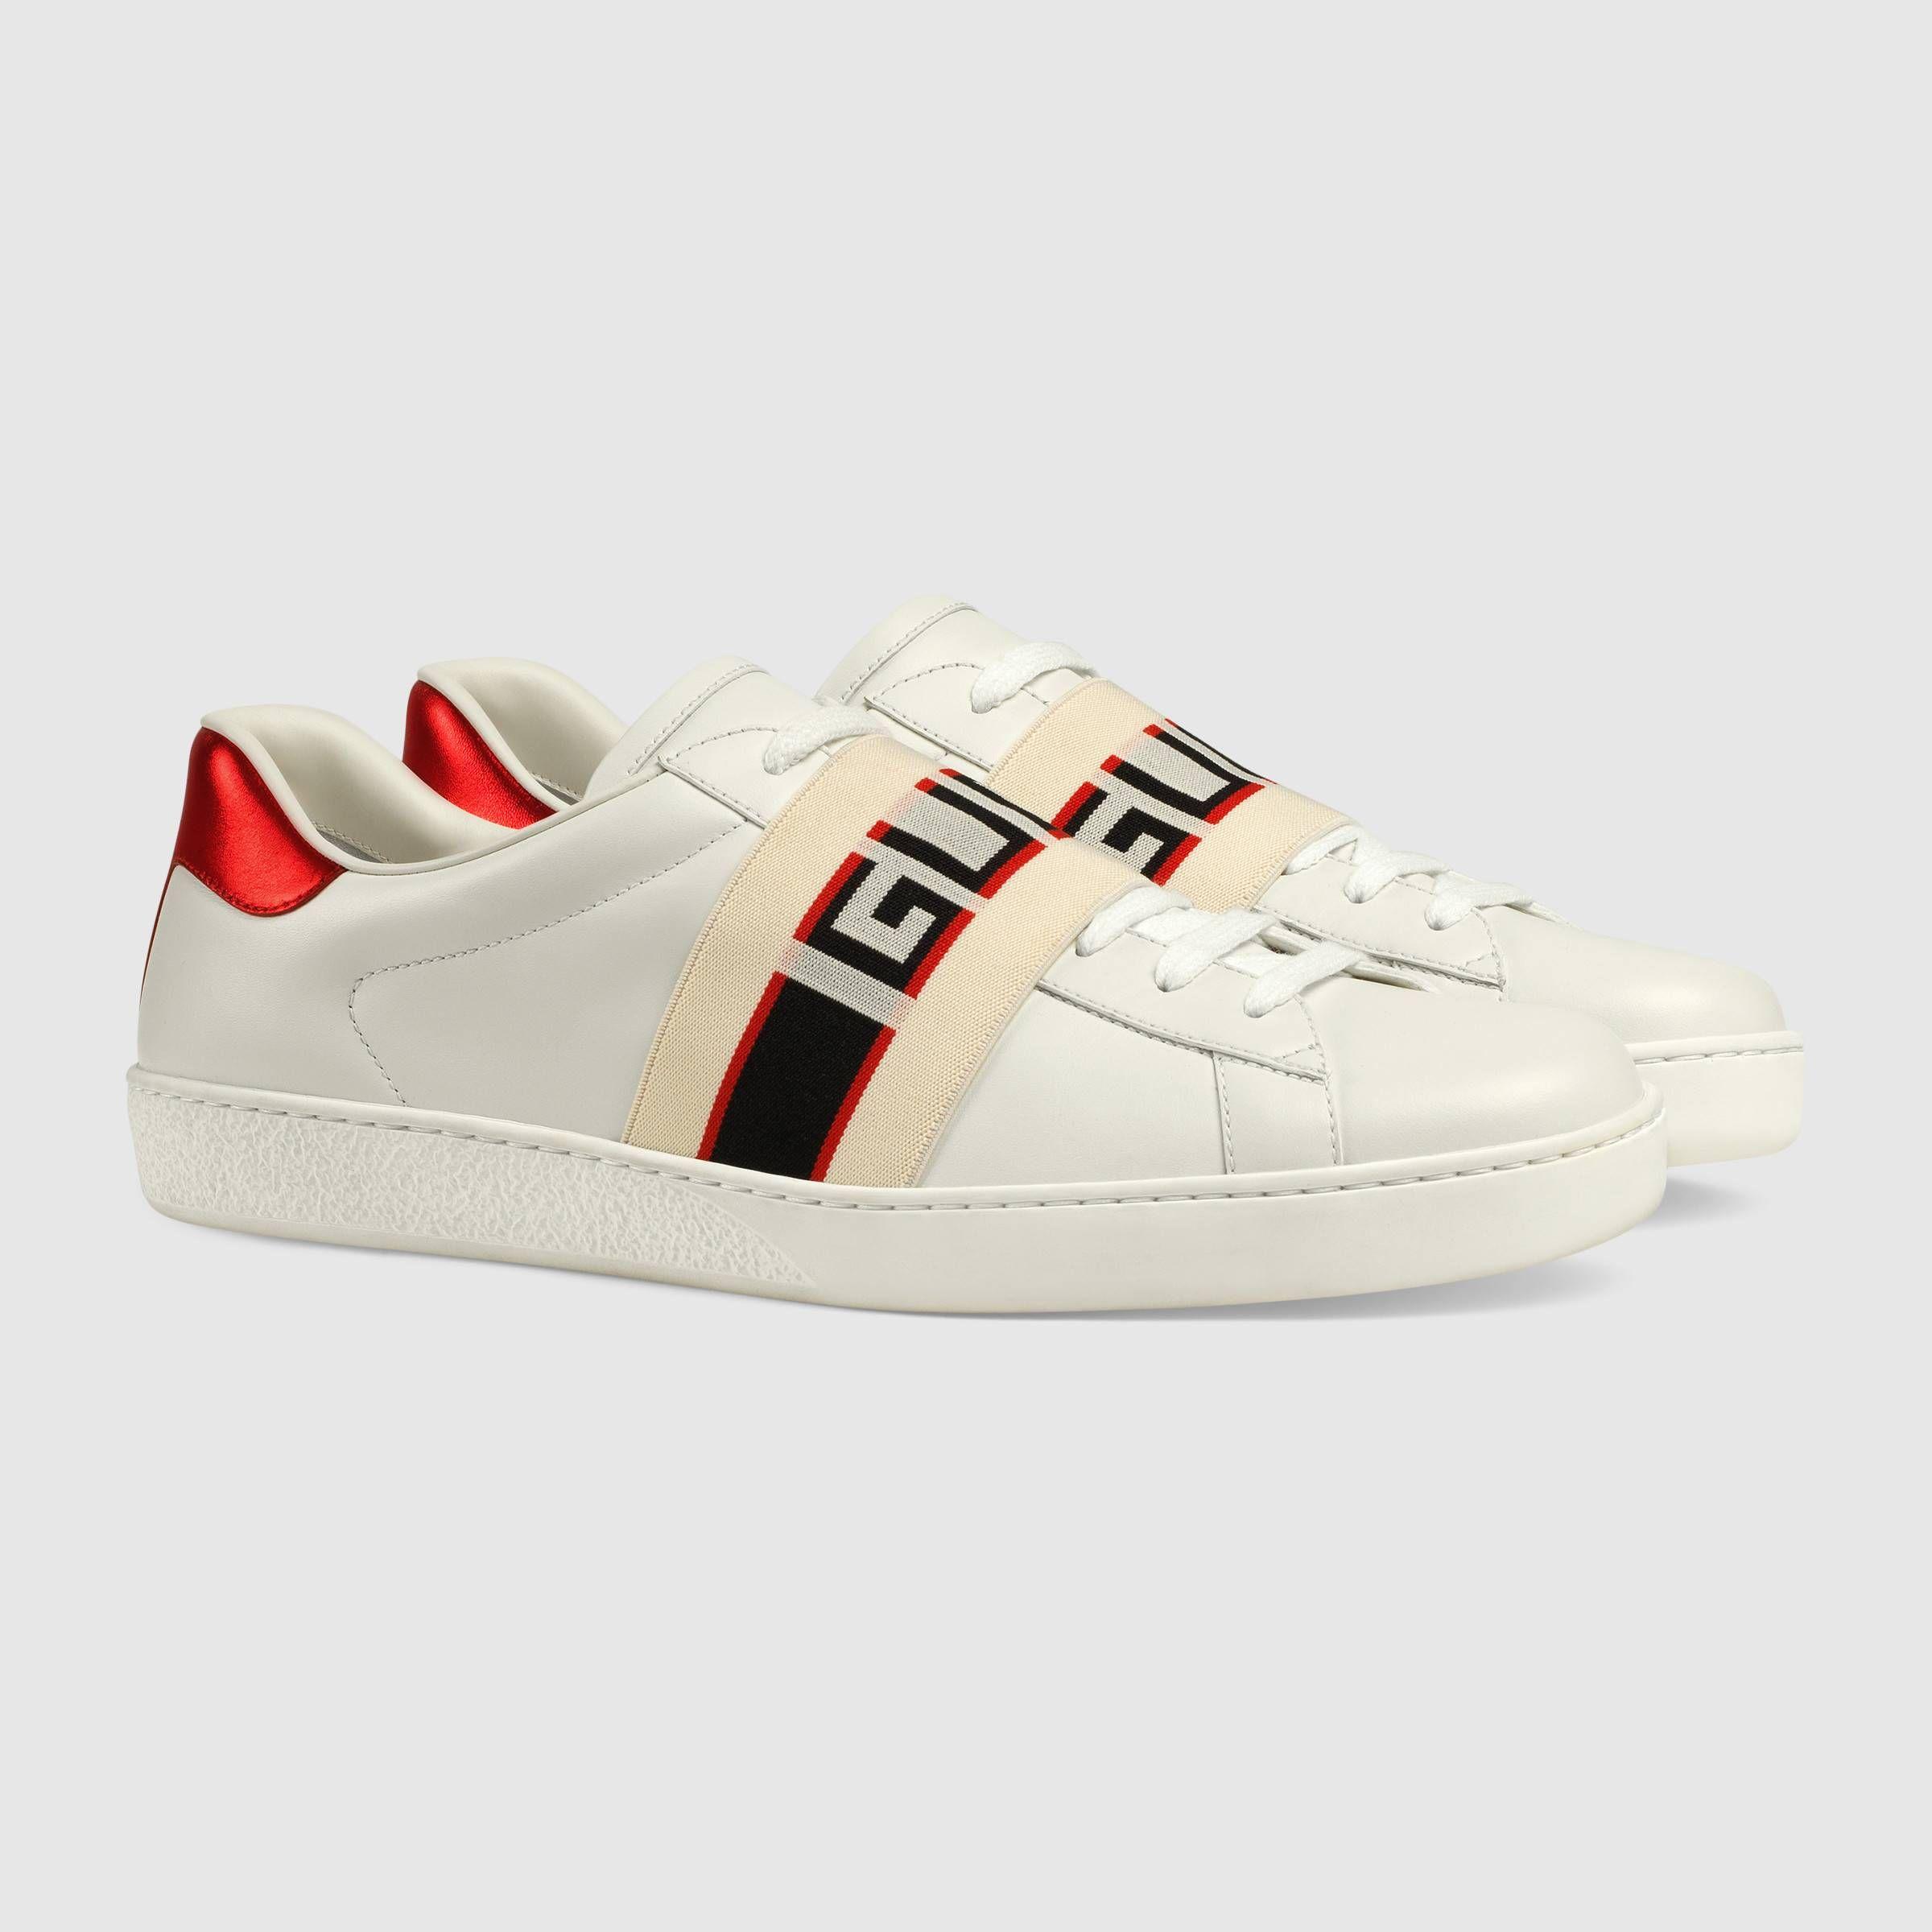 Gucci Men S Ace Gucci Stripe Sneaker Sneakers Men Fashion Sneakers Men Sneakers